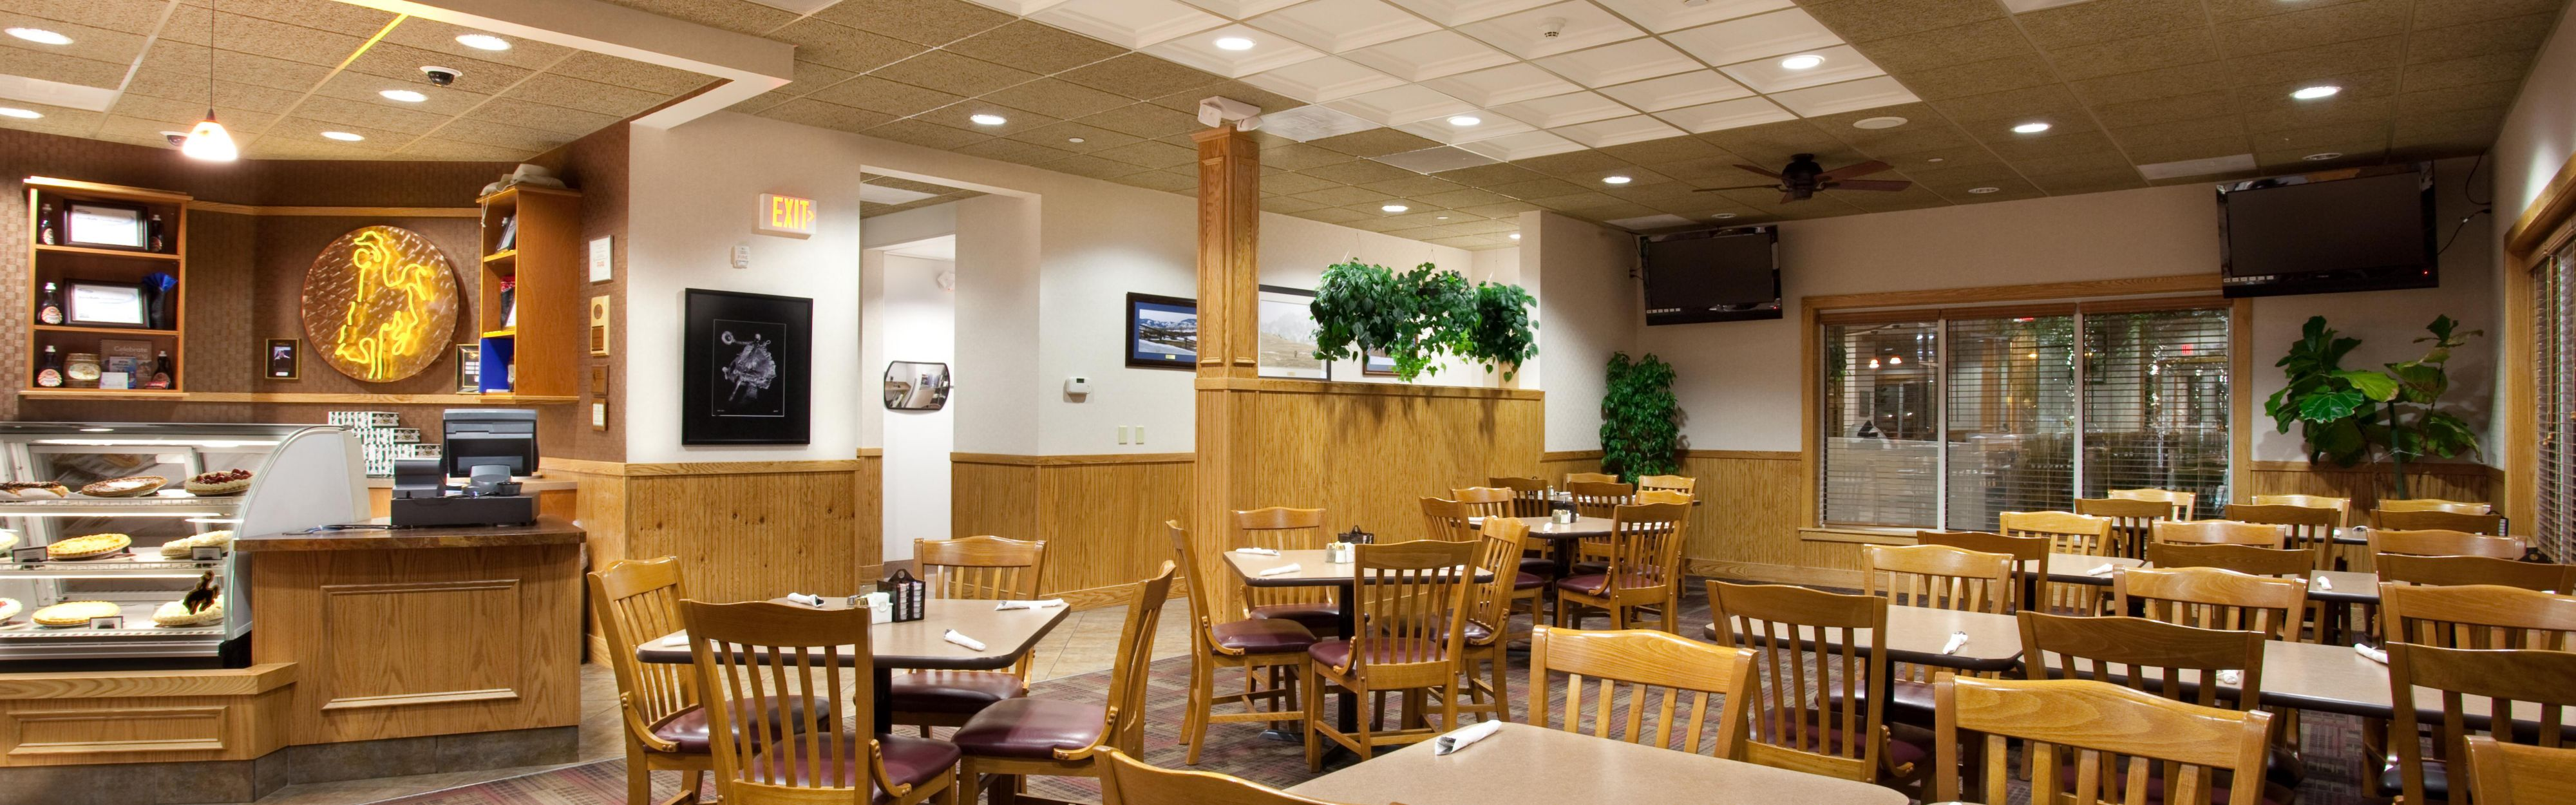 Holiday Inn Laramie image 3